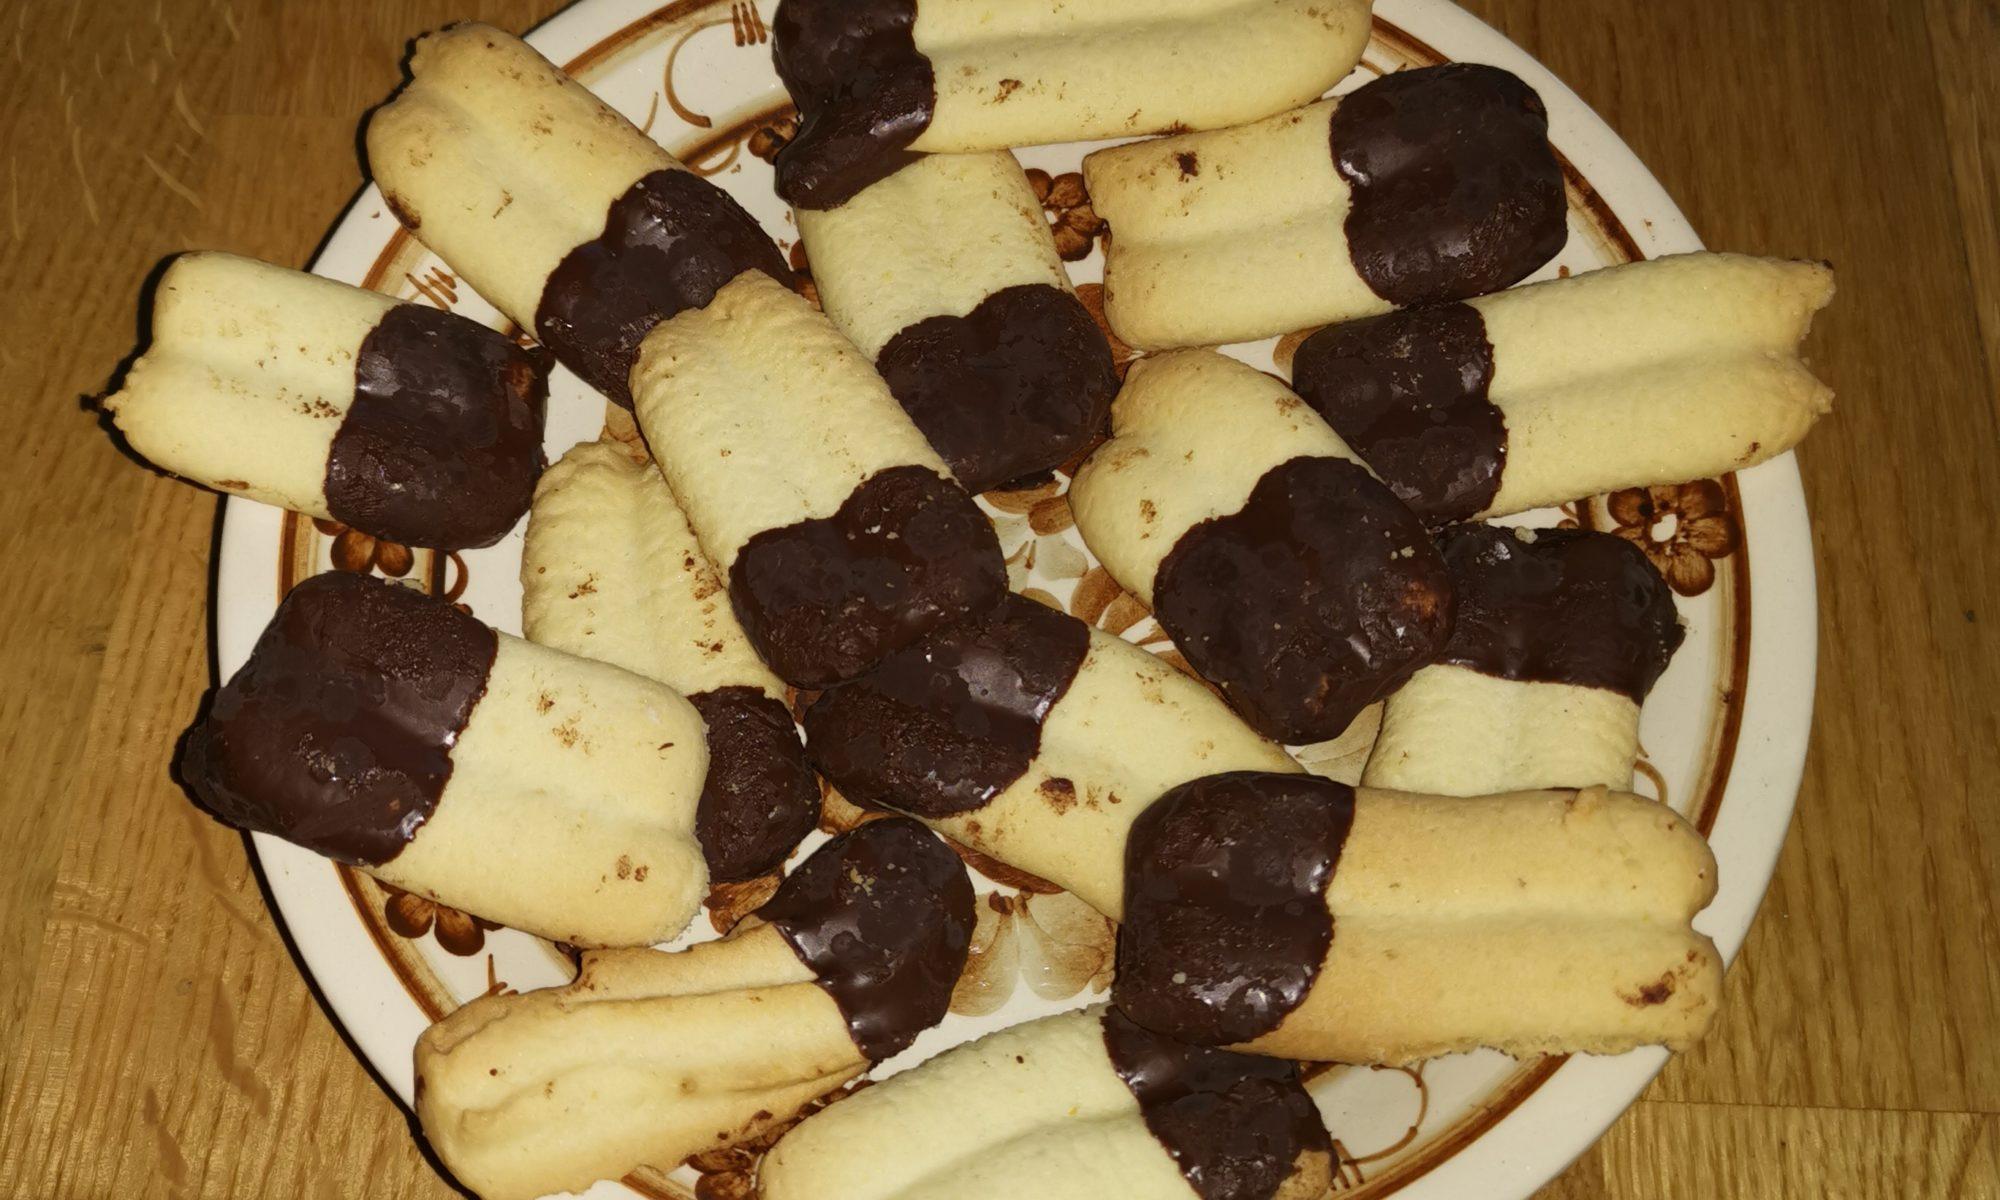 Spritzgebäck in Schokolade getunkt